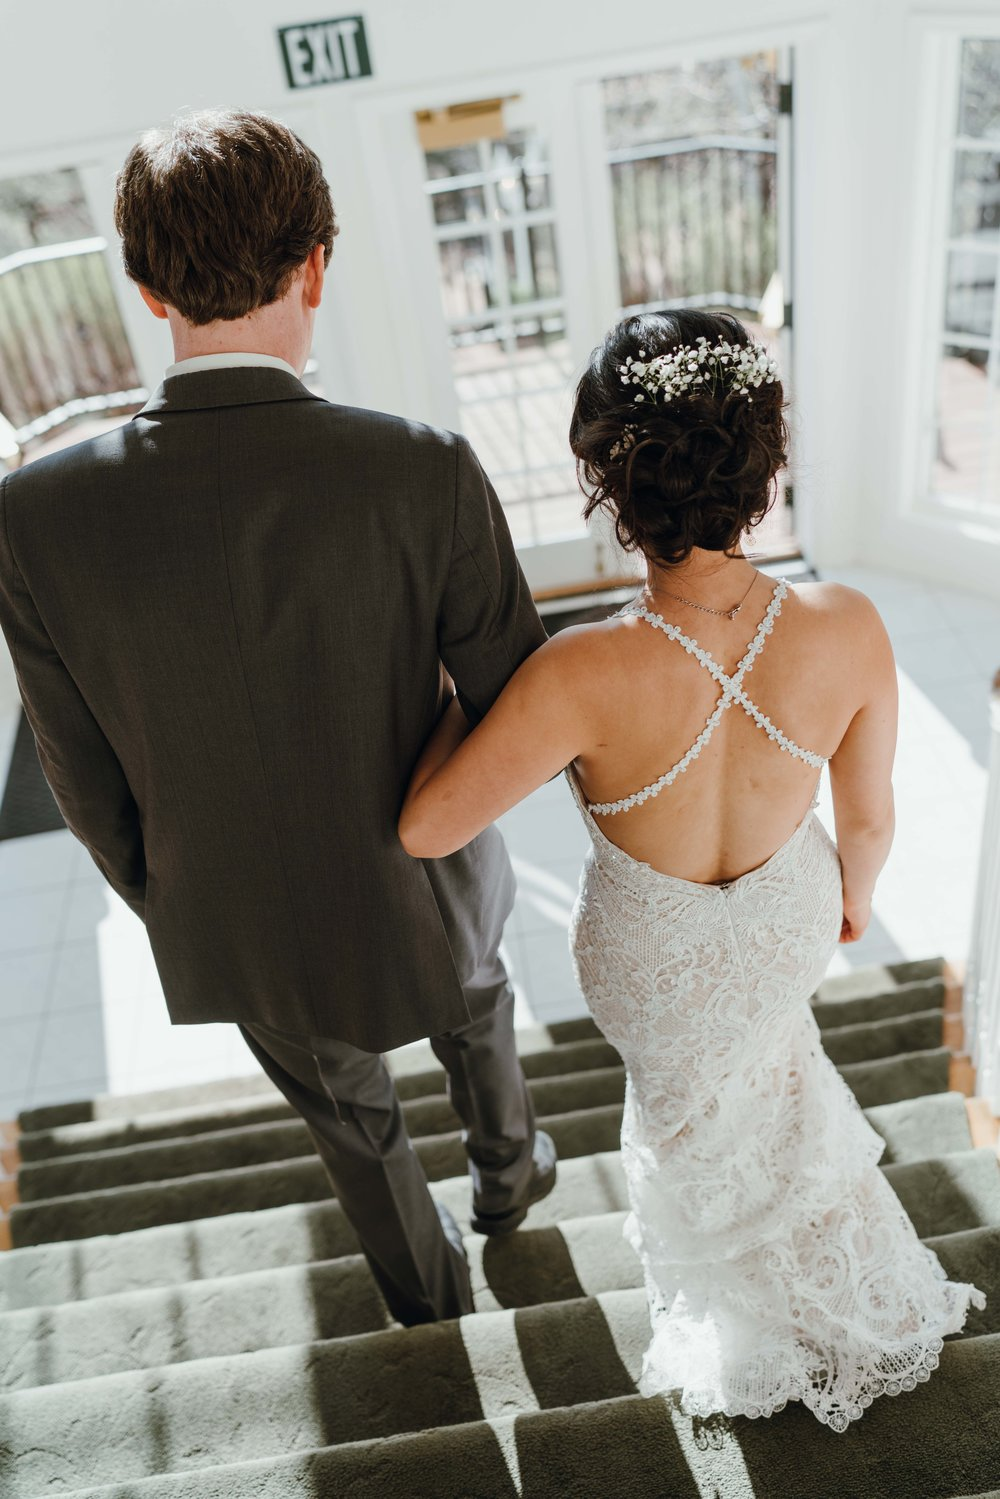 denver wedding photographer lioncrest manor in lyons ben and mali -DSC06285.jpg